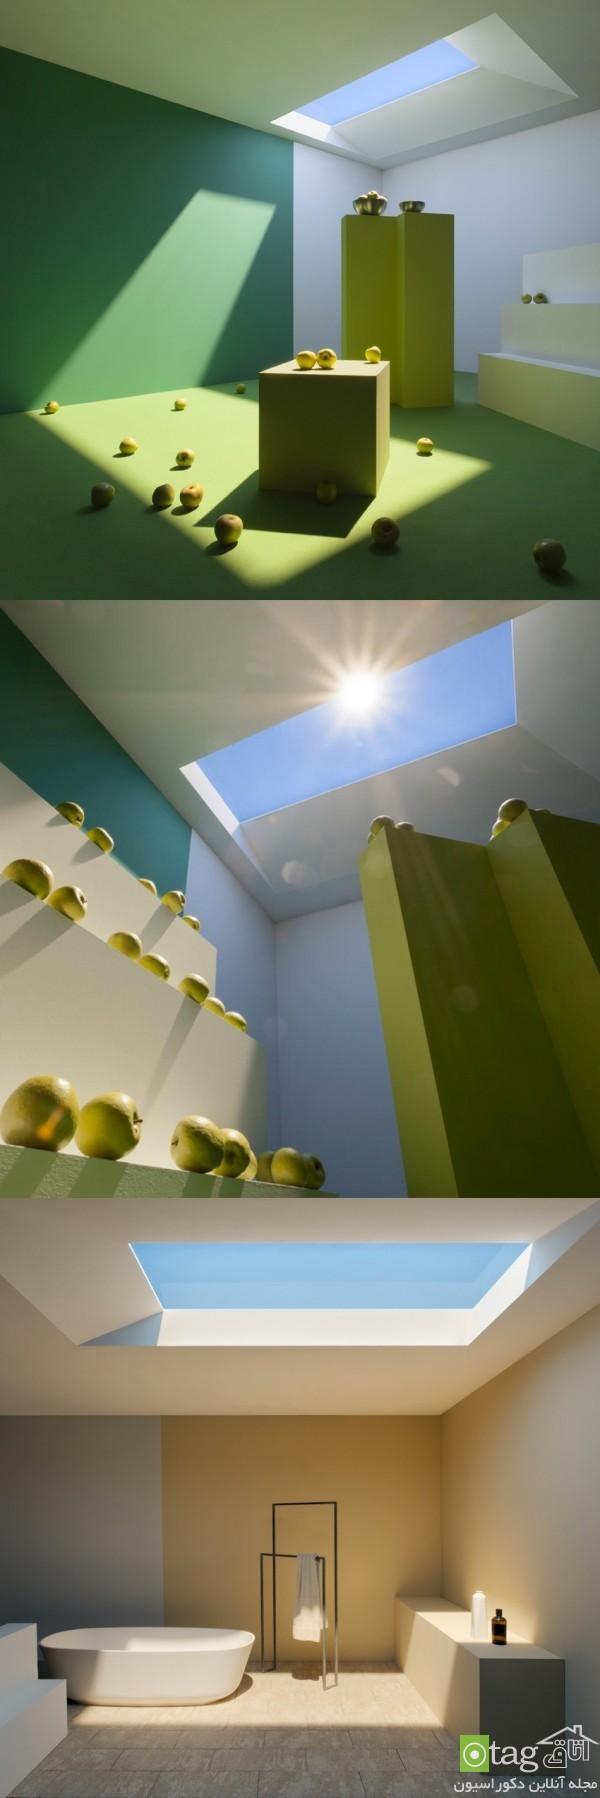 creative-night-light-design-ideas (12)